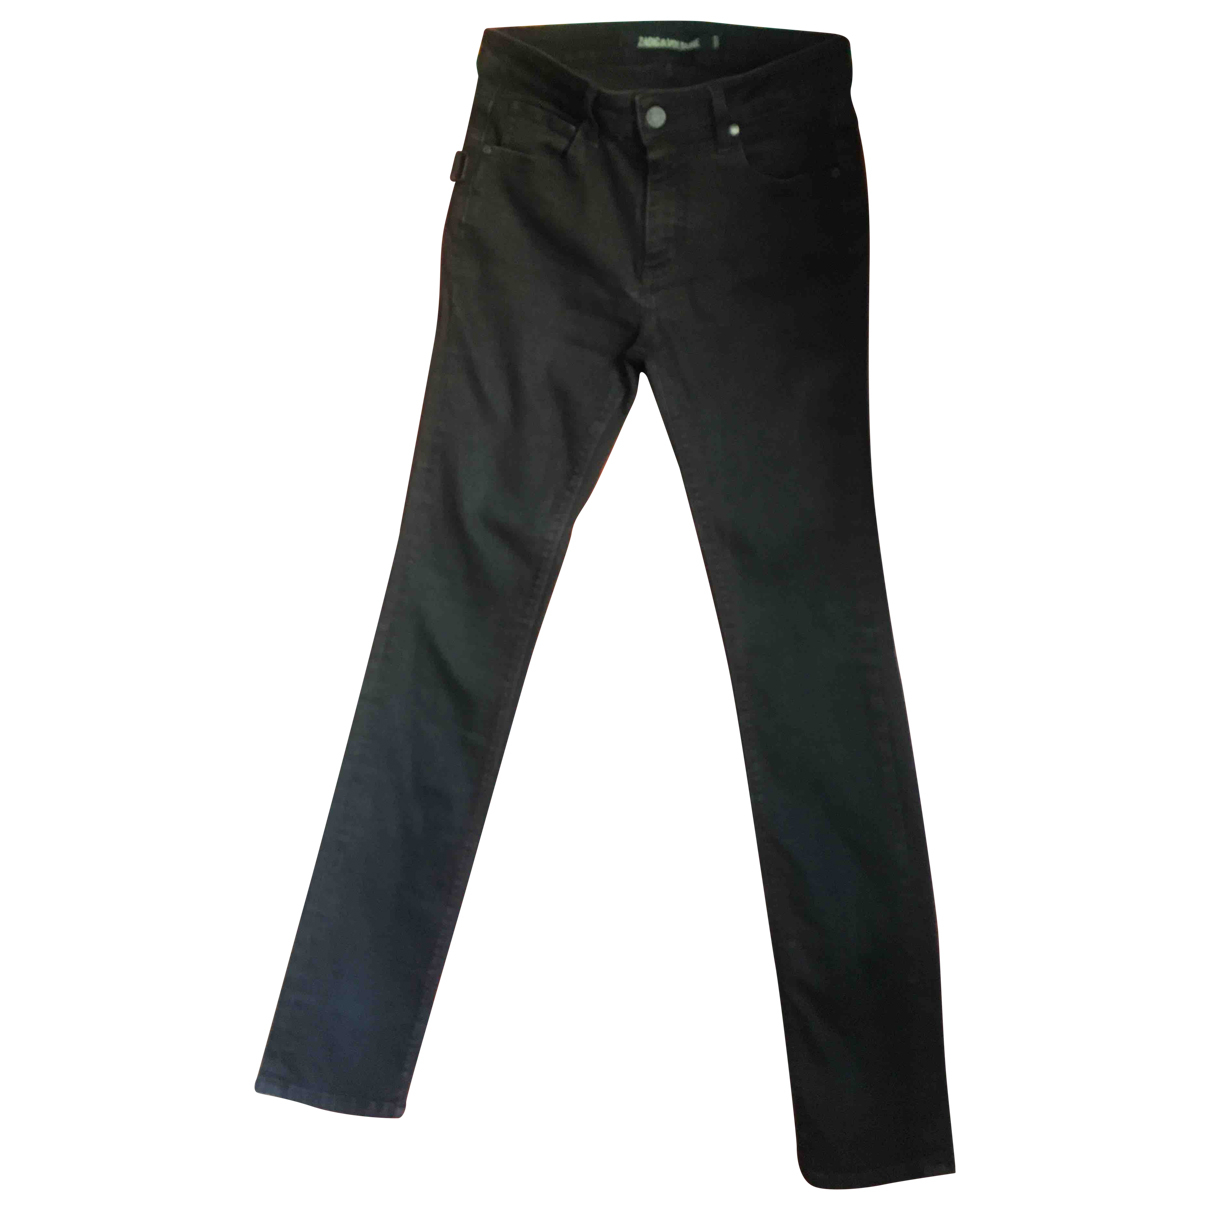 Zadig & Voltaire Spring Summer 2019 Black Denim - Jeans Trousers for Women M International